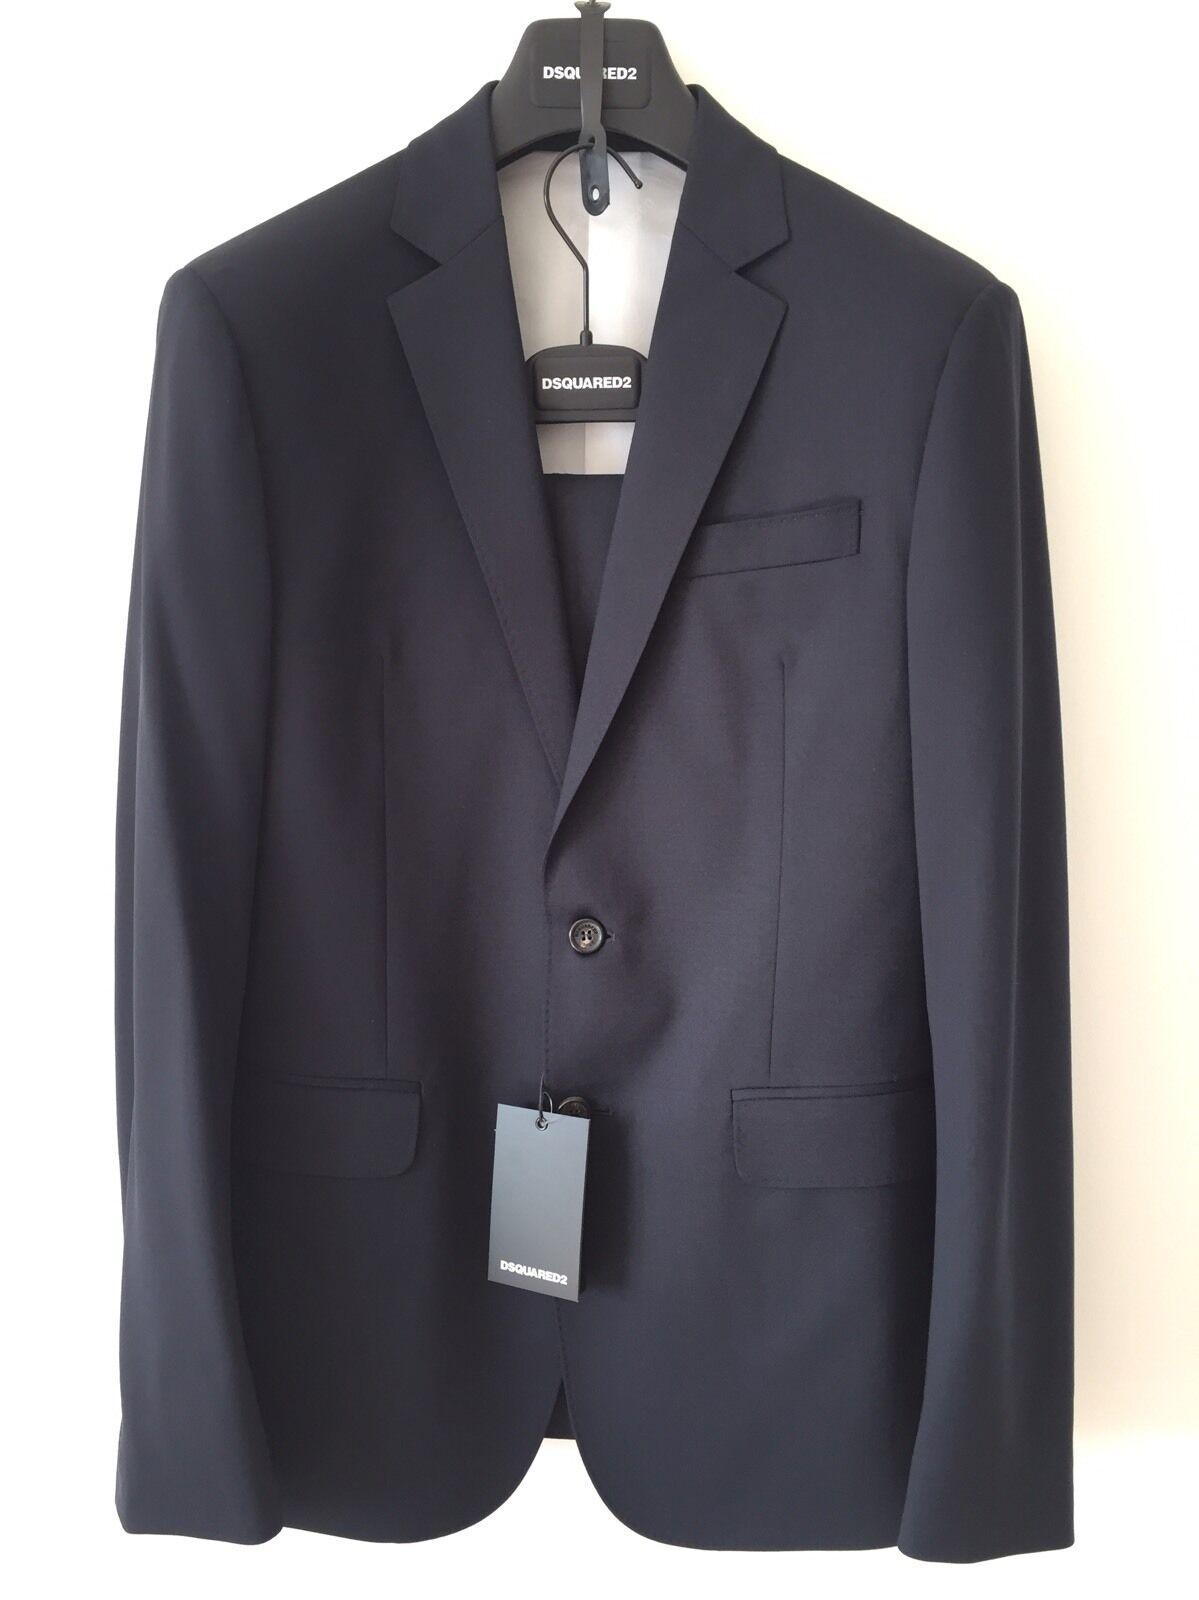 Dsquarot2 Dsquarot Paris Single-Breasted Suit - Navy - UK 42 IT 52   New